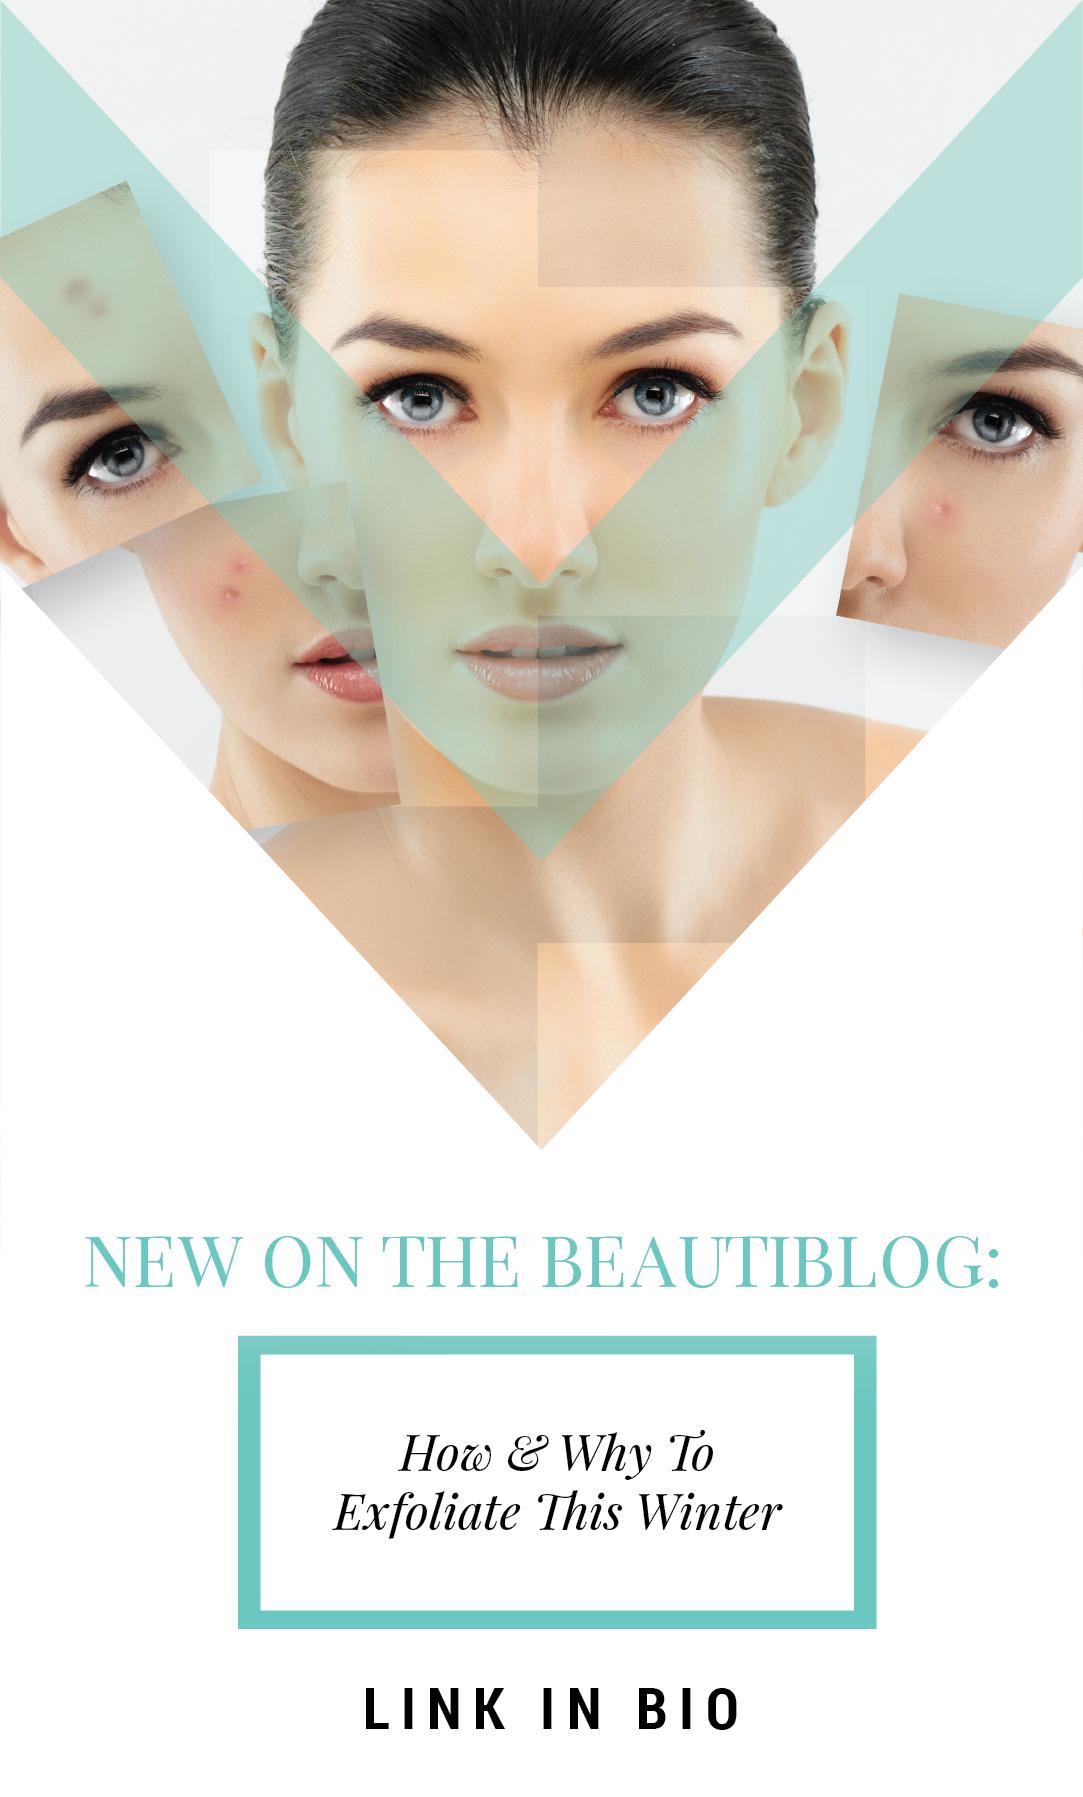 How To Exfoliate Your Skin Skin Care Spa Dead Skin Cells Skin